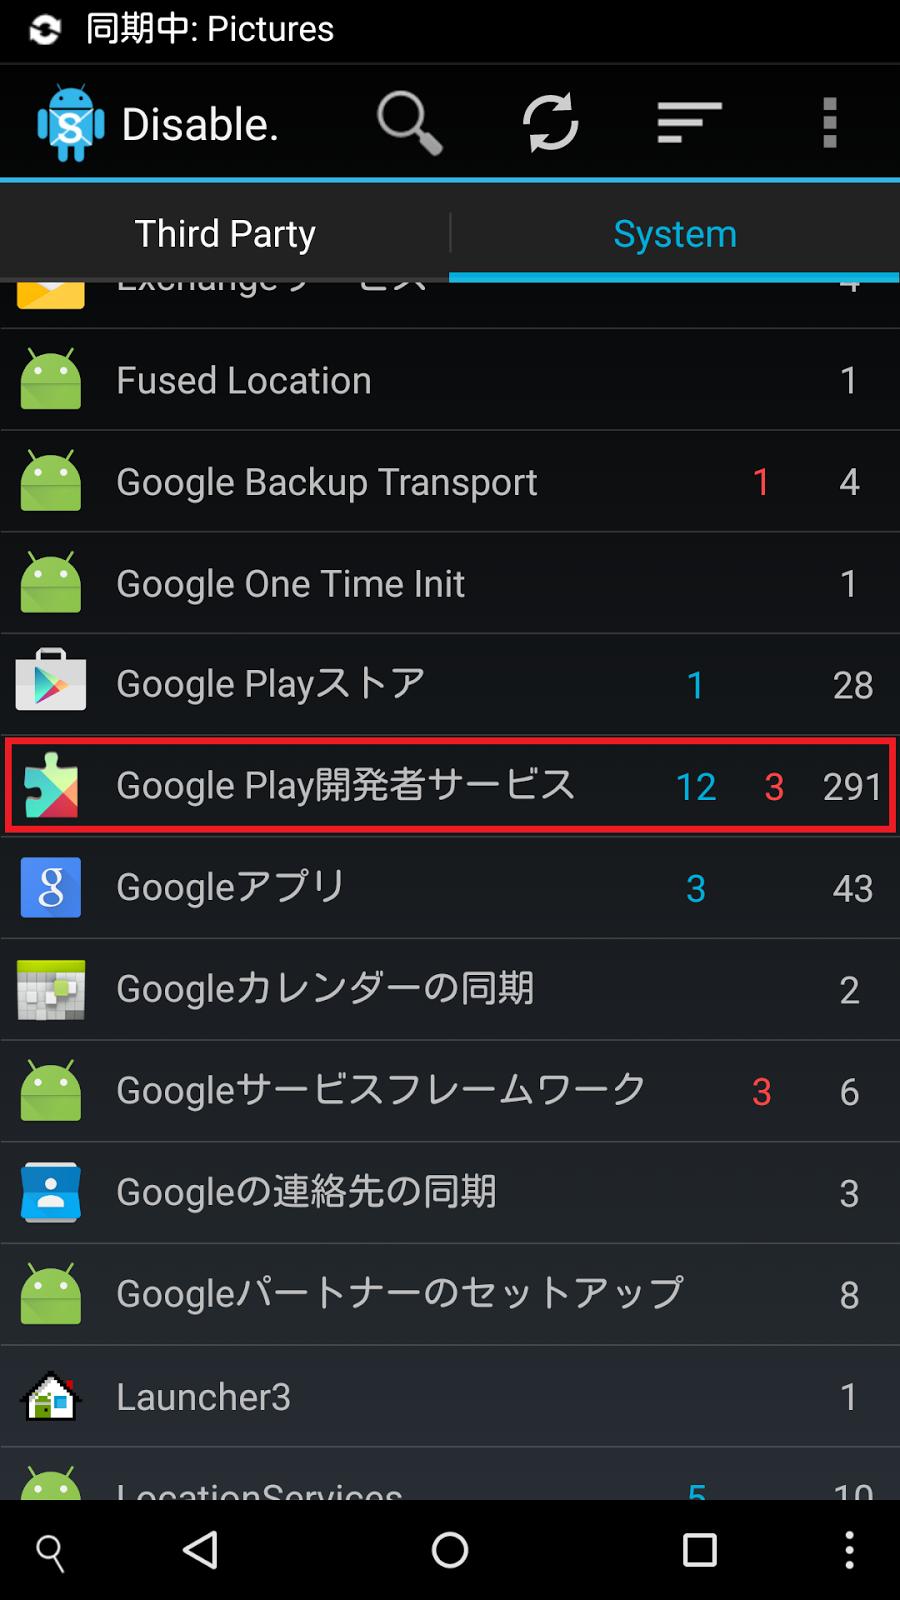 Play 者 繰り返し 停止 開発 Google サービス